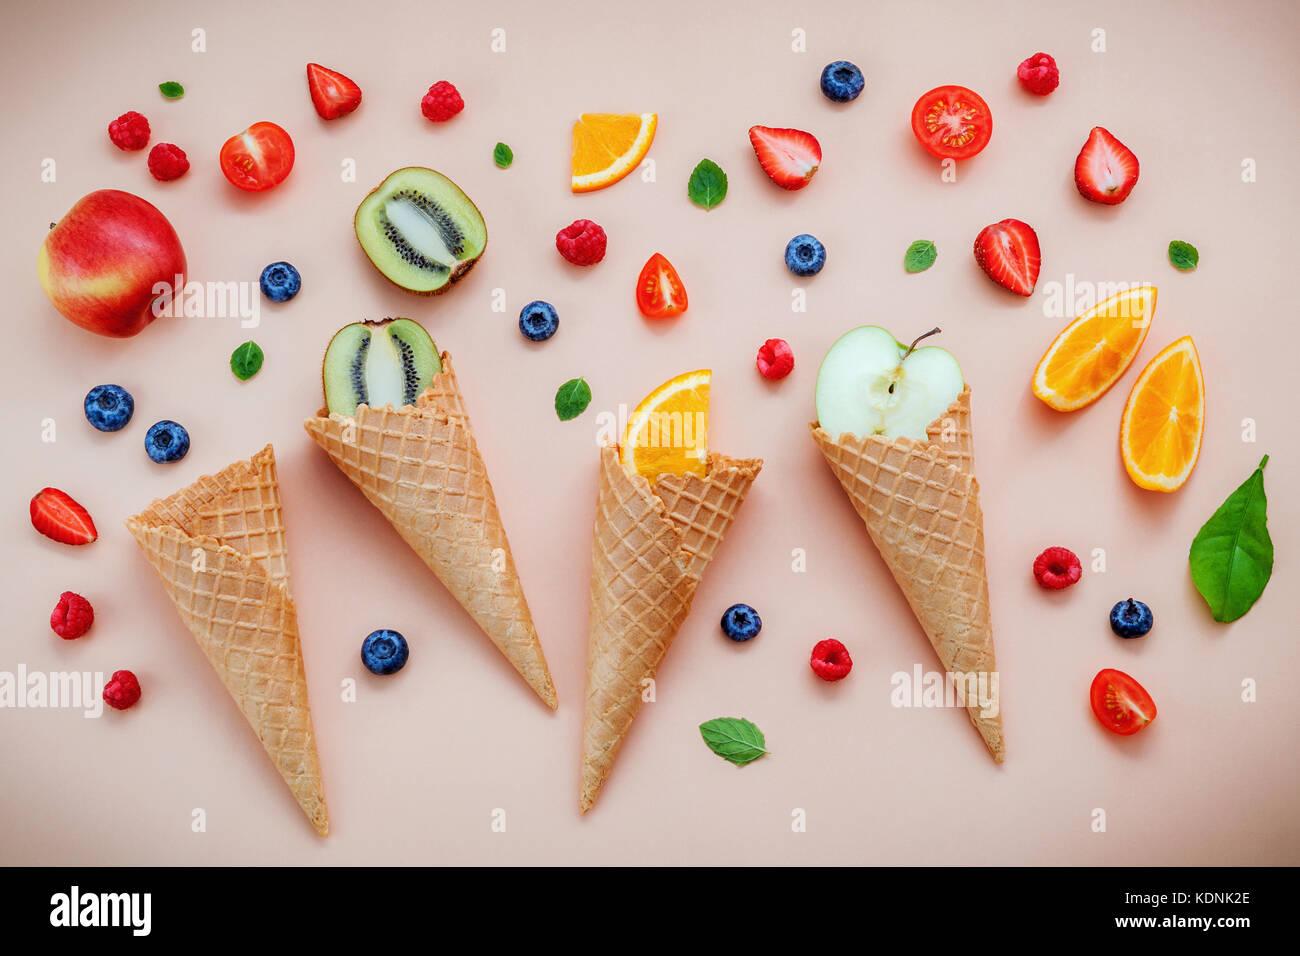 Cones and colorful various fruits raspberry ,blueberry ,strawberry ,orange slice , halve kiwi ,apple,tomato and Stock Photo